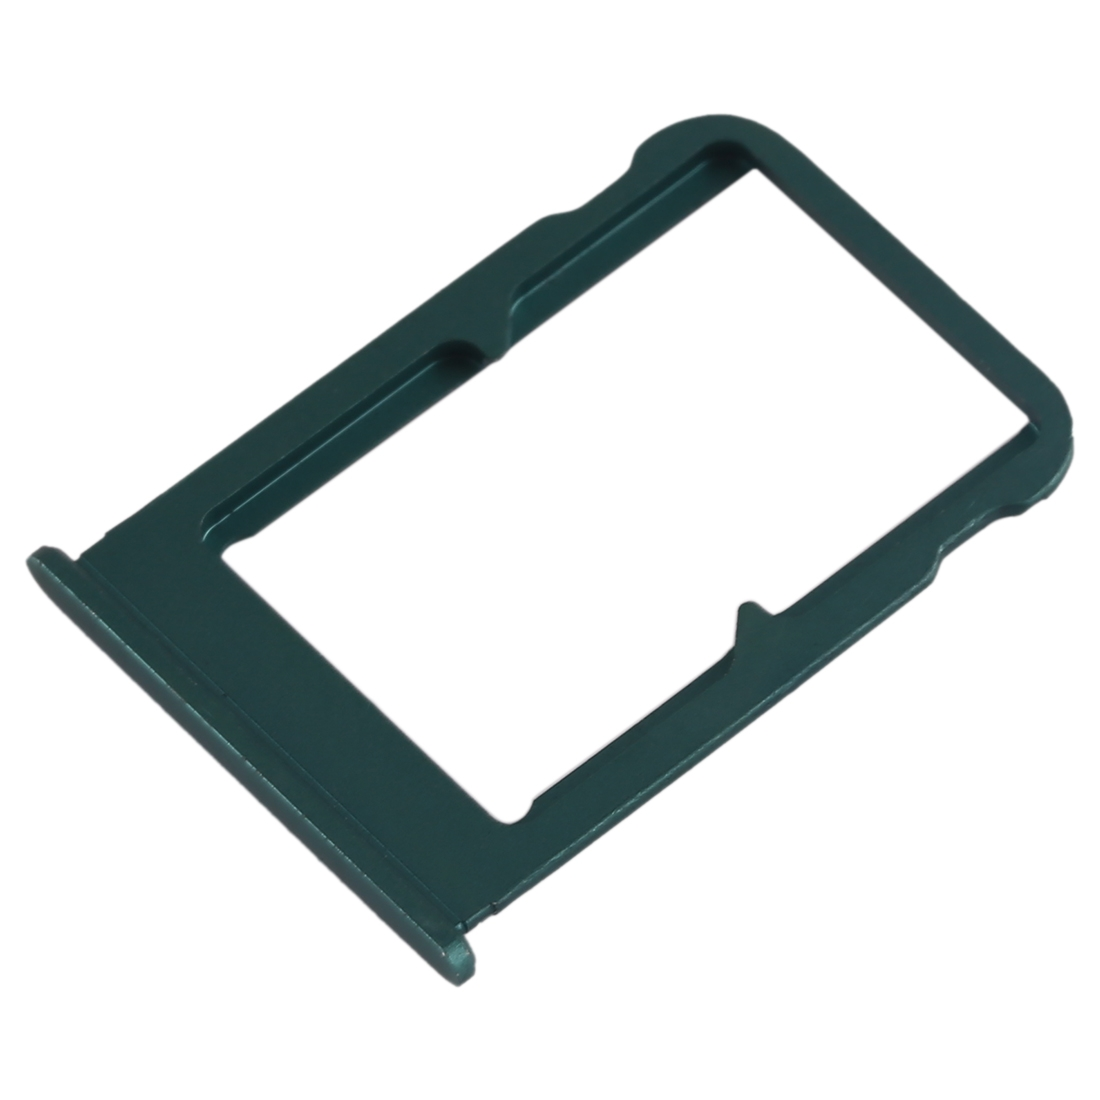 Bandeja de tarjeta SIM para Xiaomi Mi Mix 3 - Verde